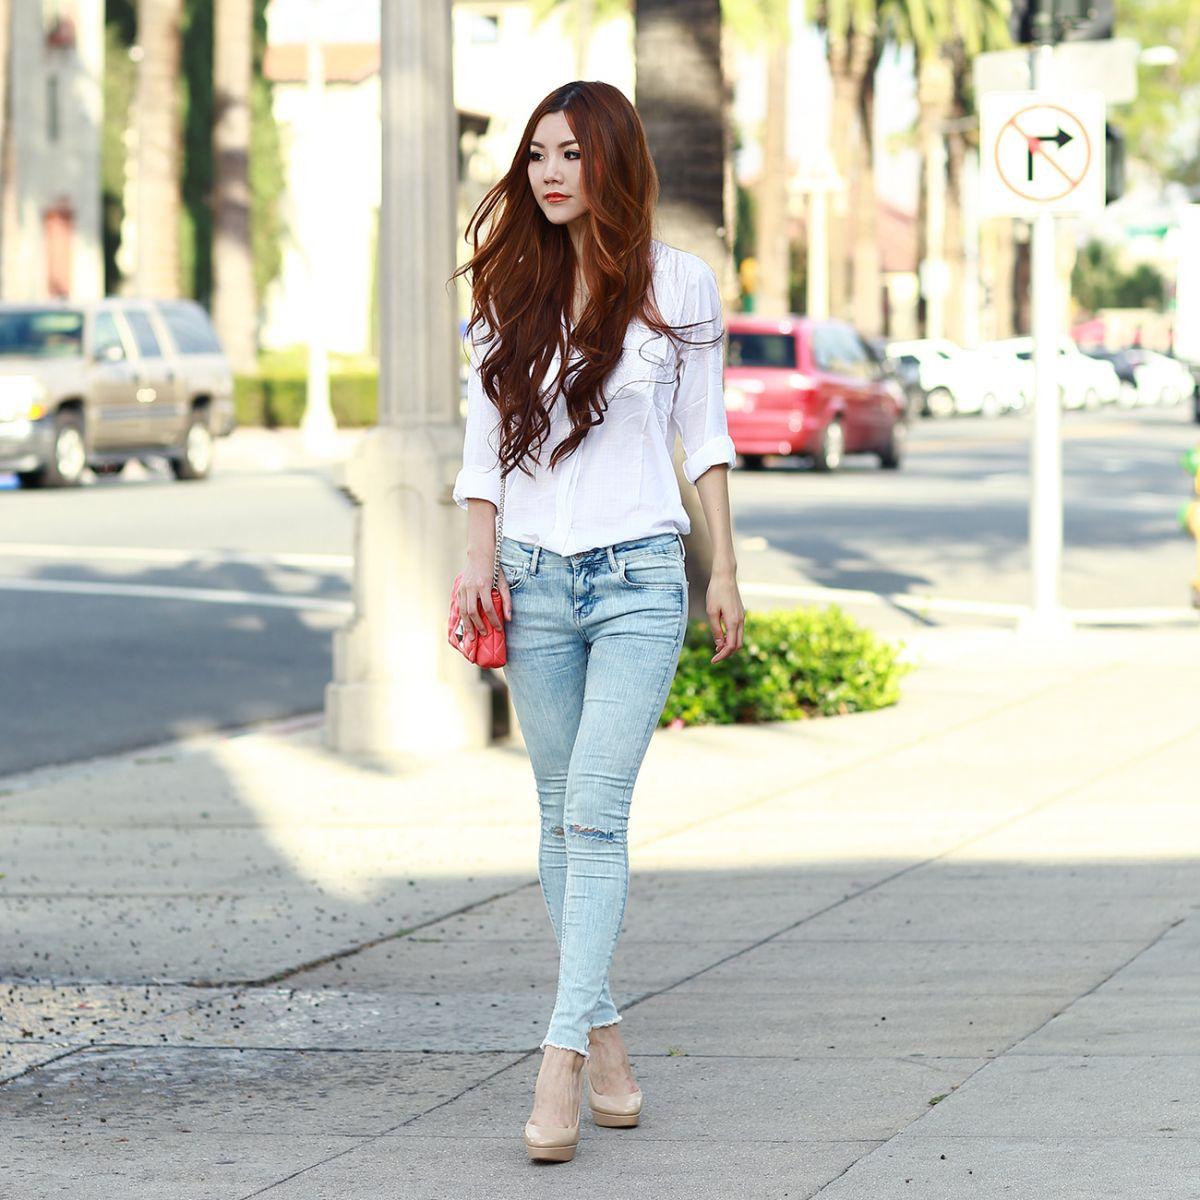 Image result for Cách mix quần jean với áo sơ mi